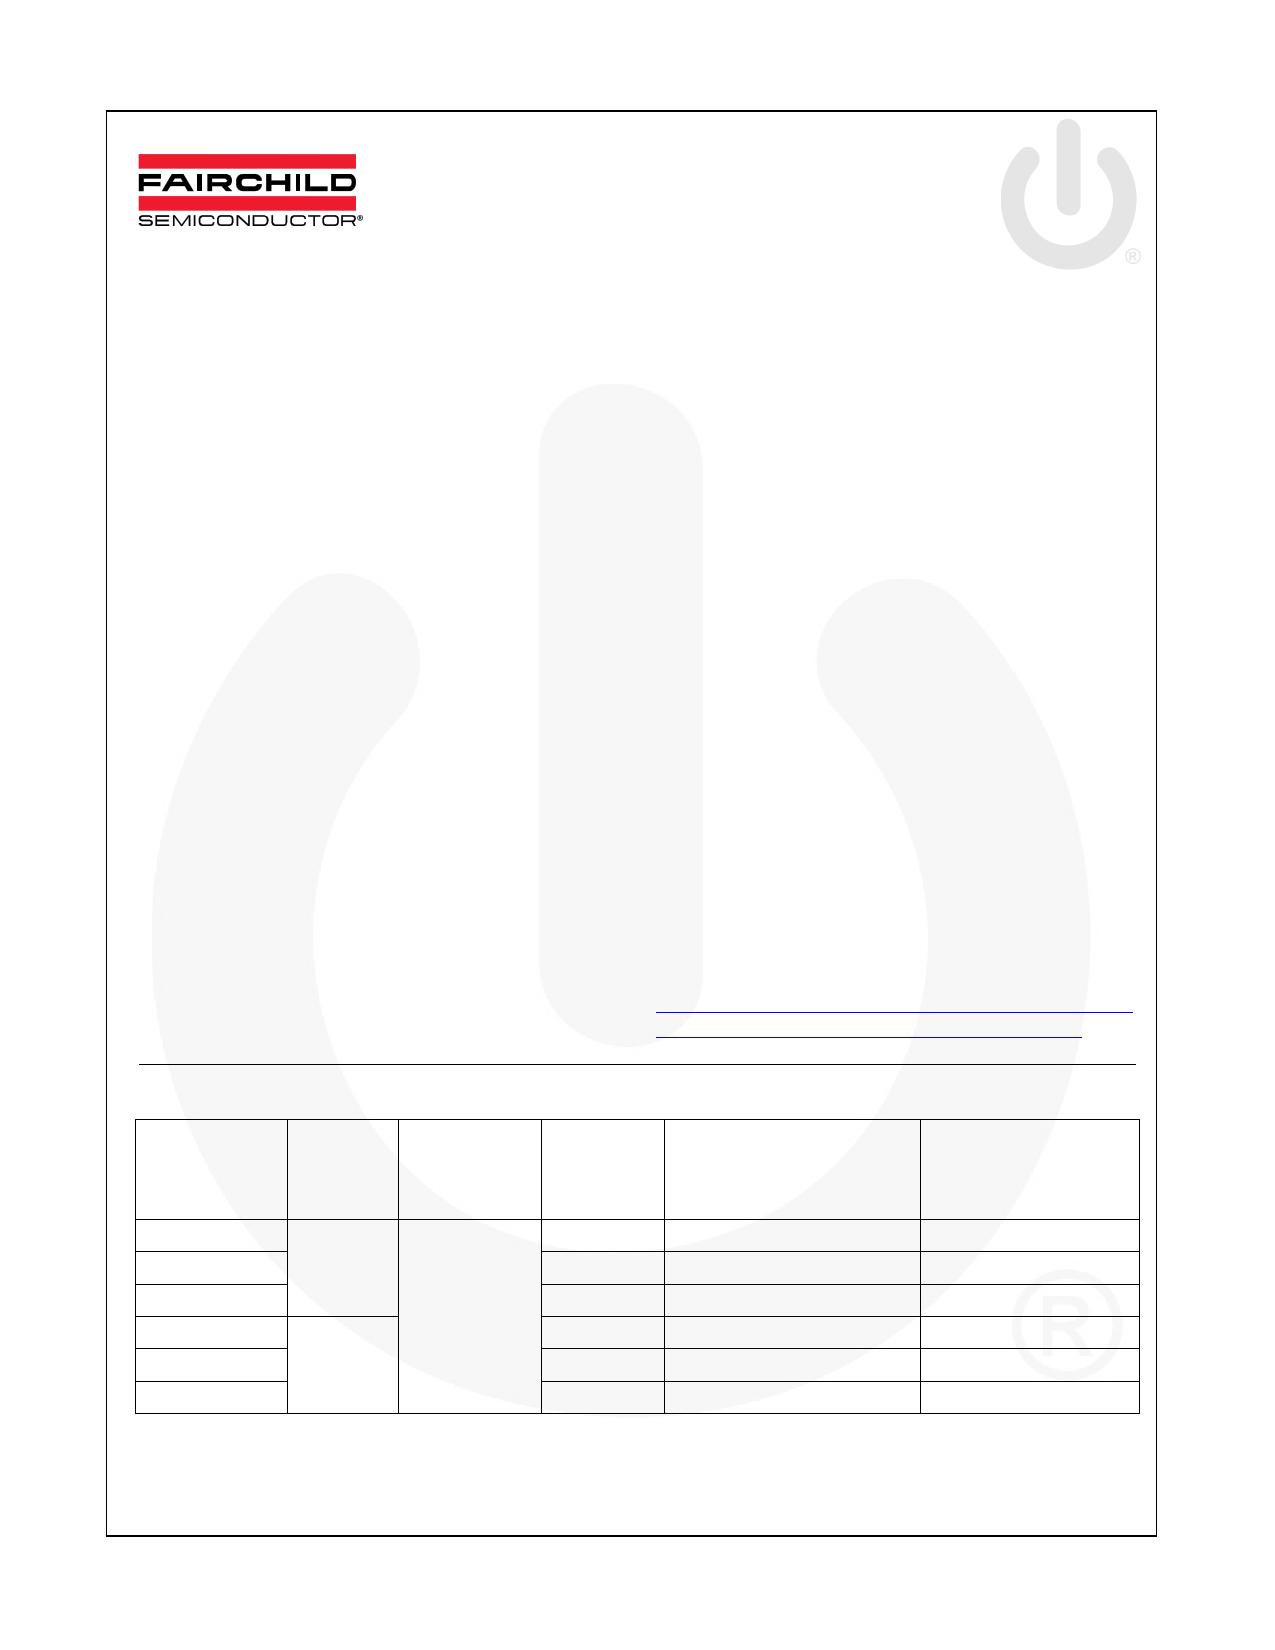 FSFR2100US datasheet